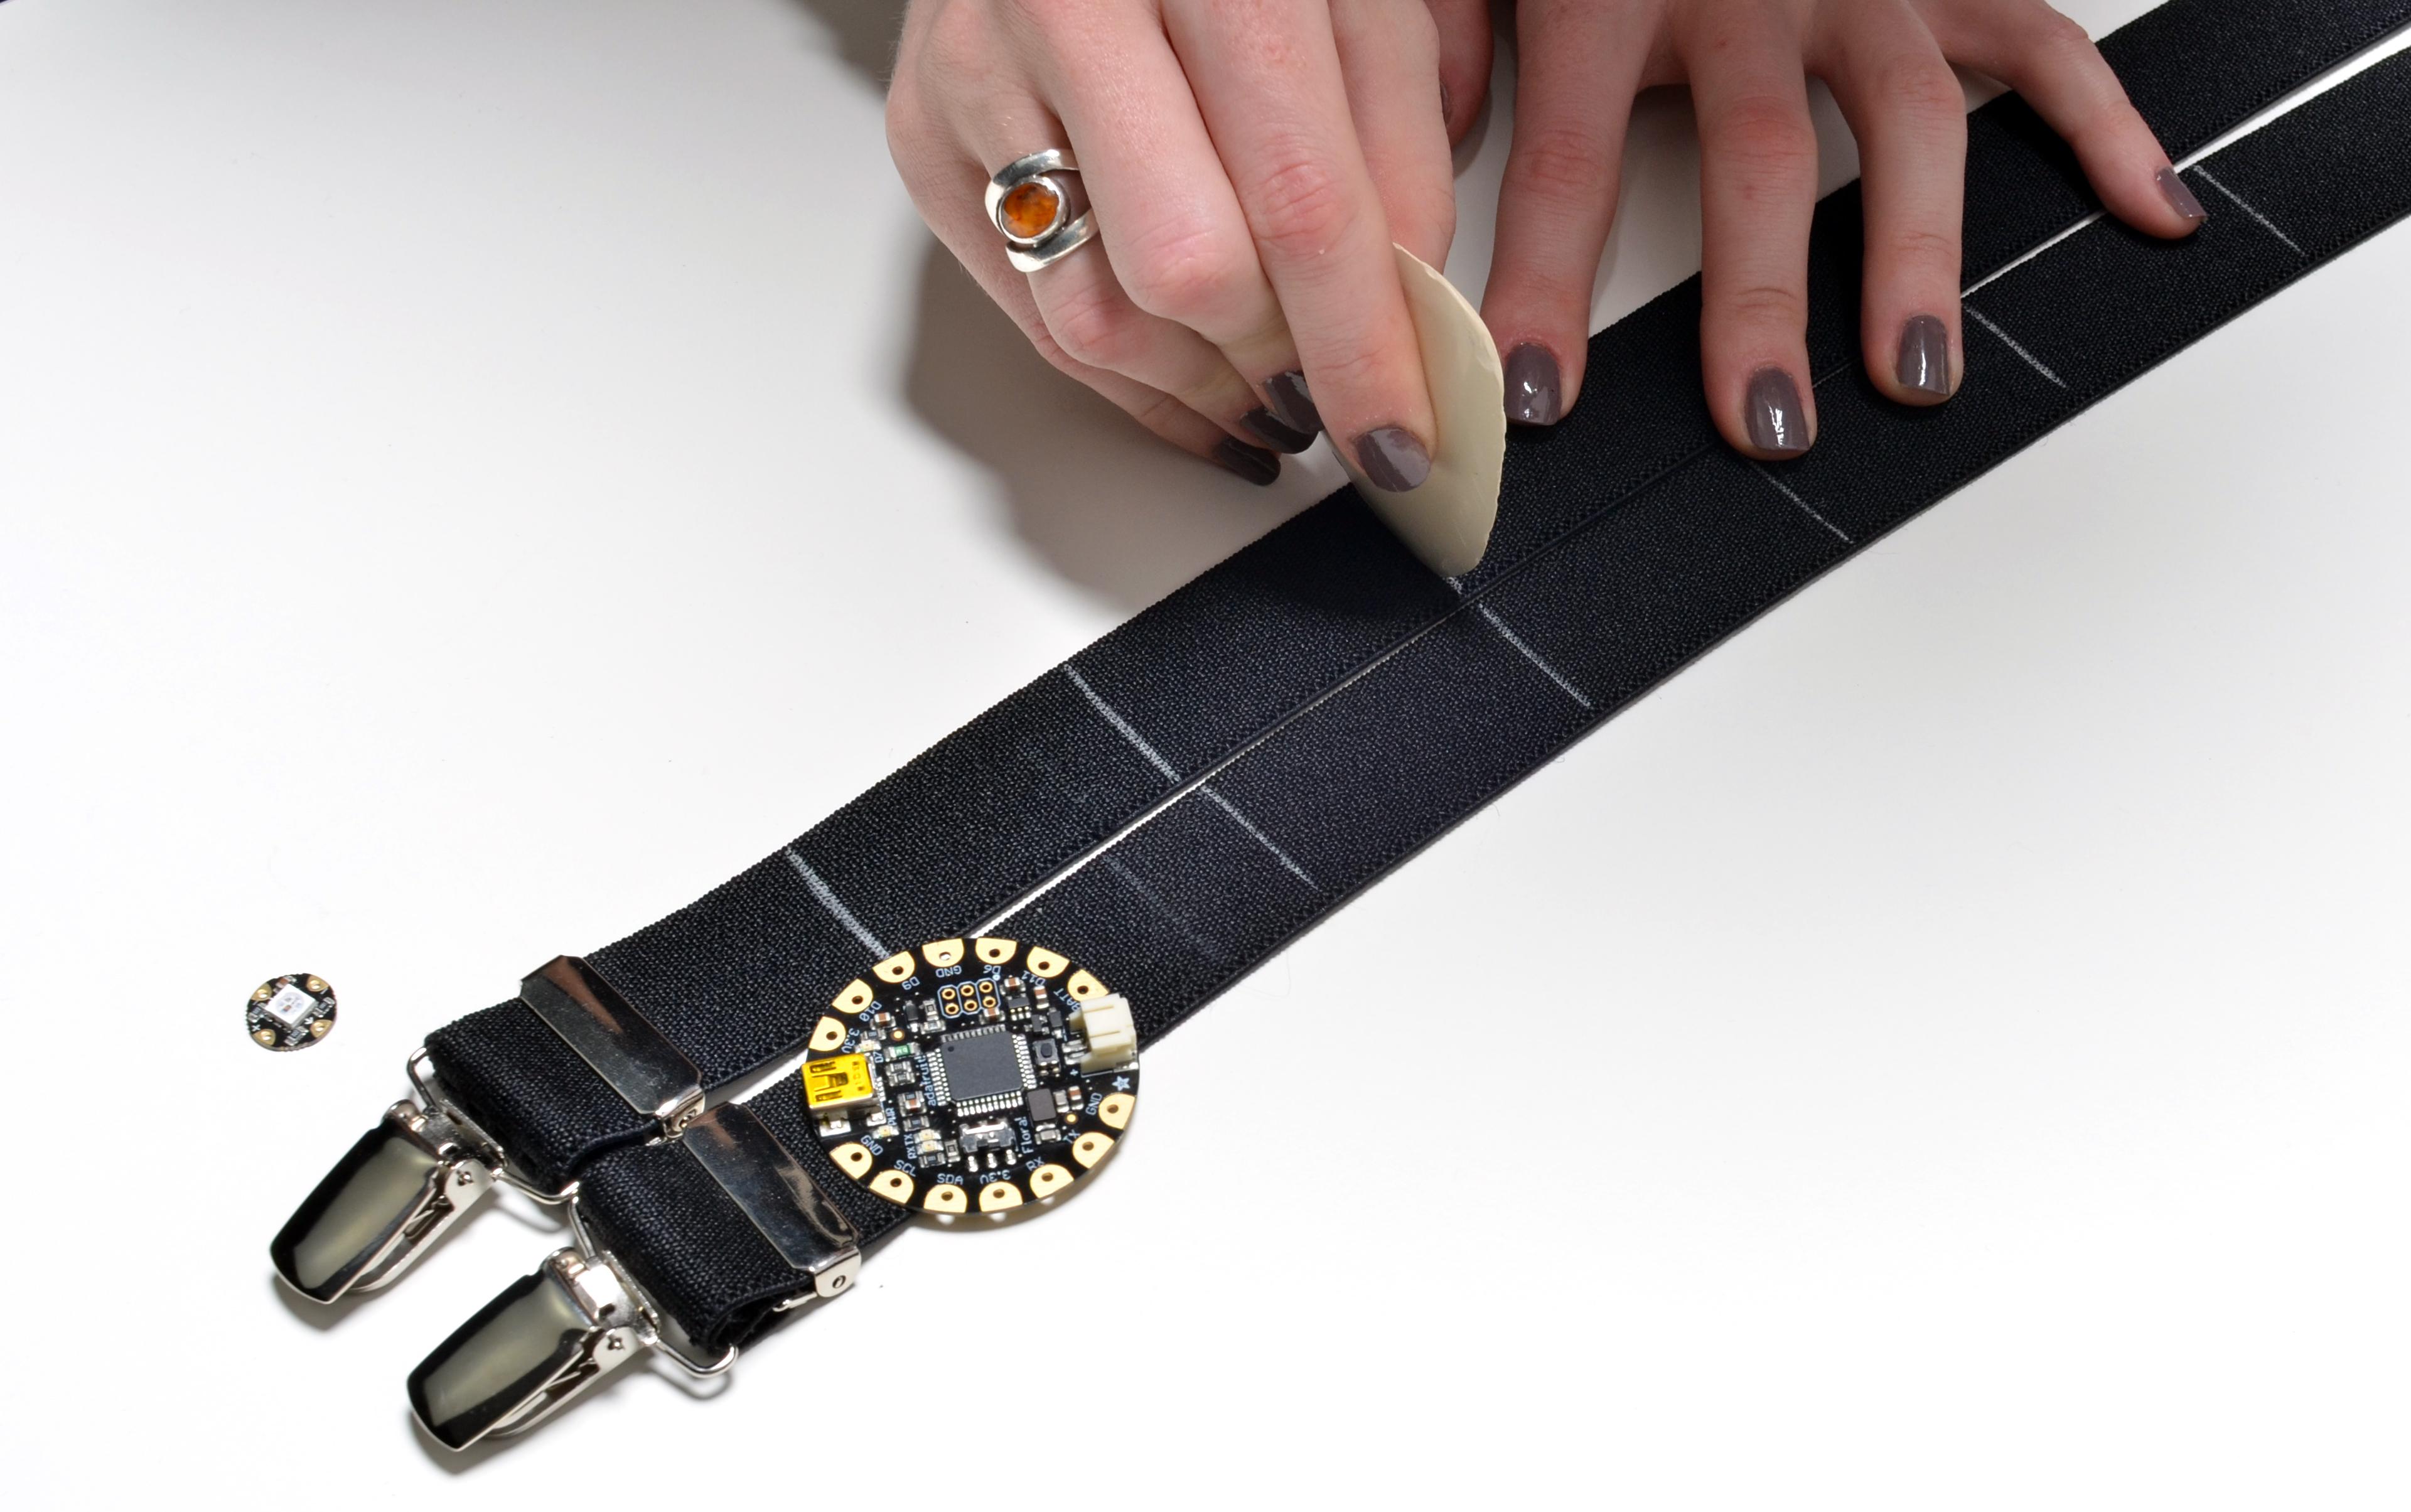 flora_adafruit-pixel-suspenders-01.jpg